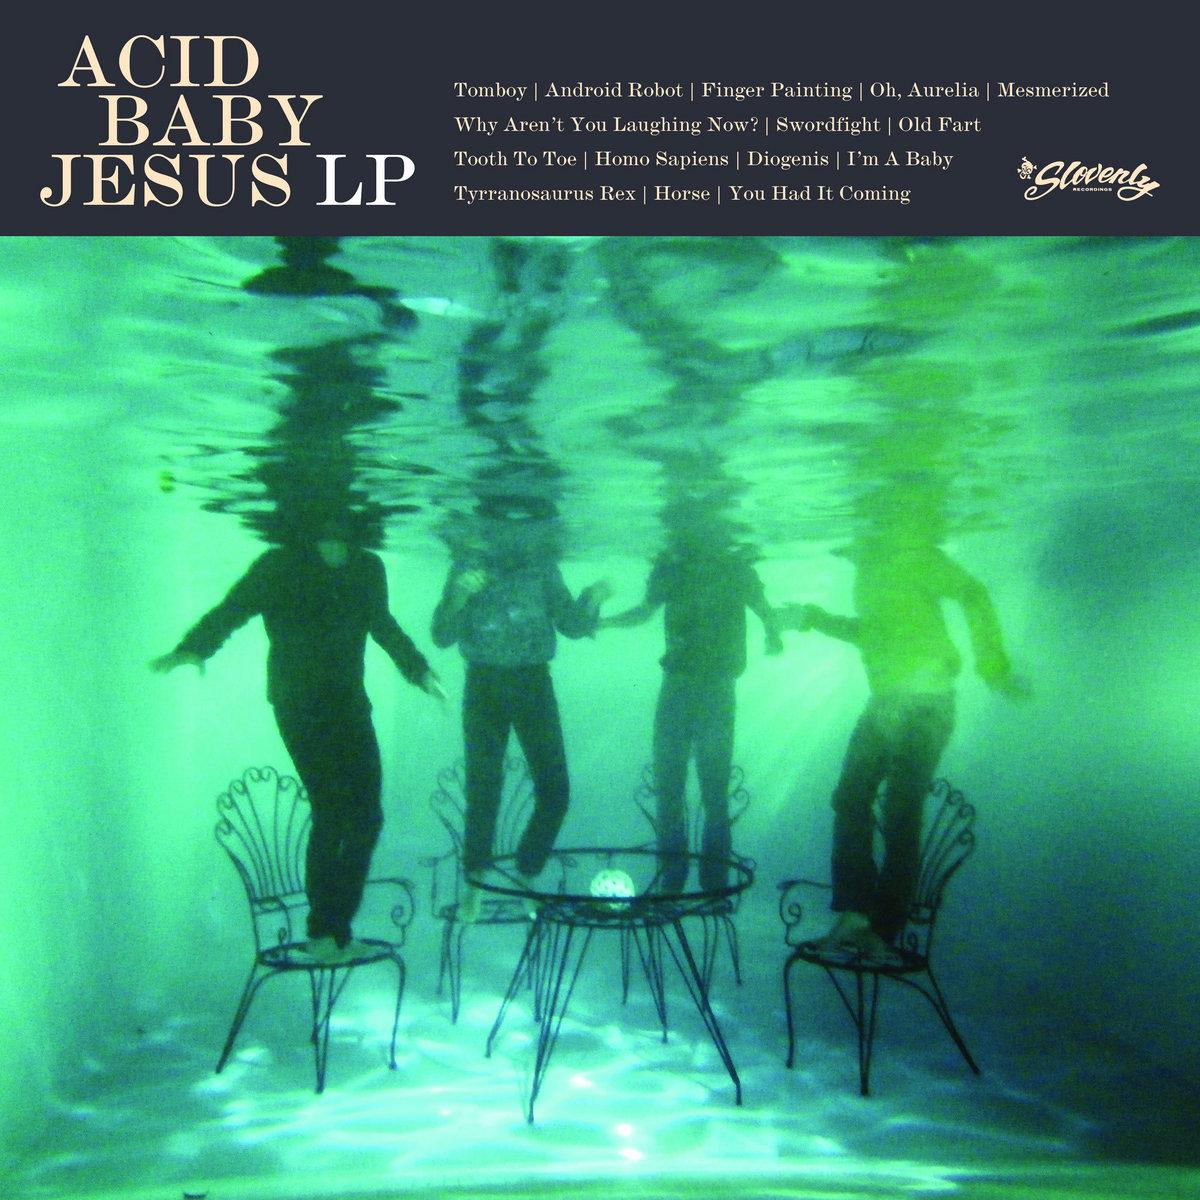 ACID BABY JESUS self-titled LP | Slovenly Recordings